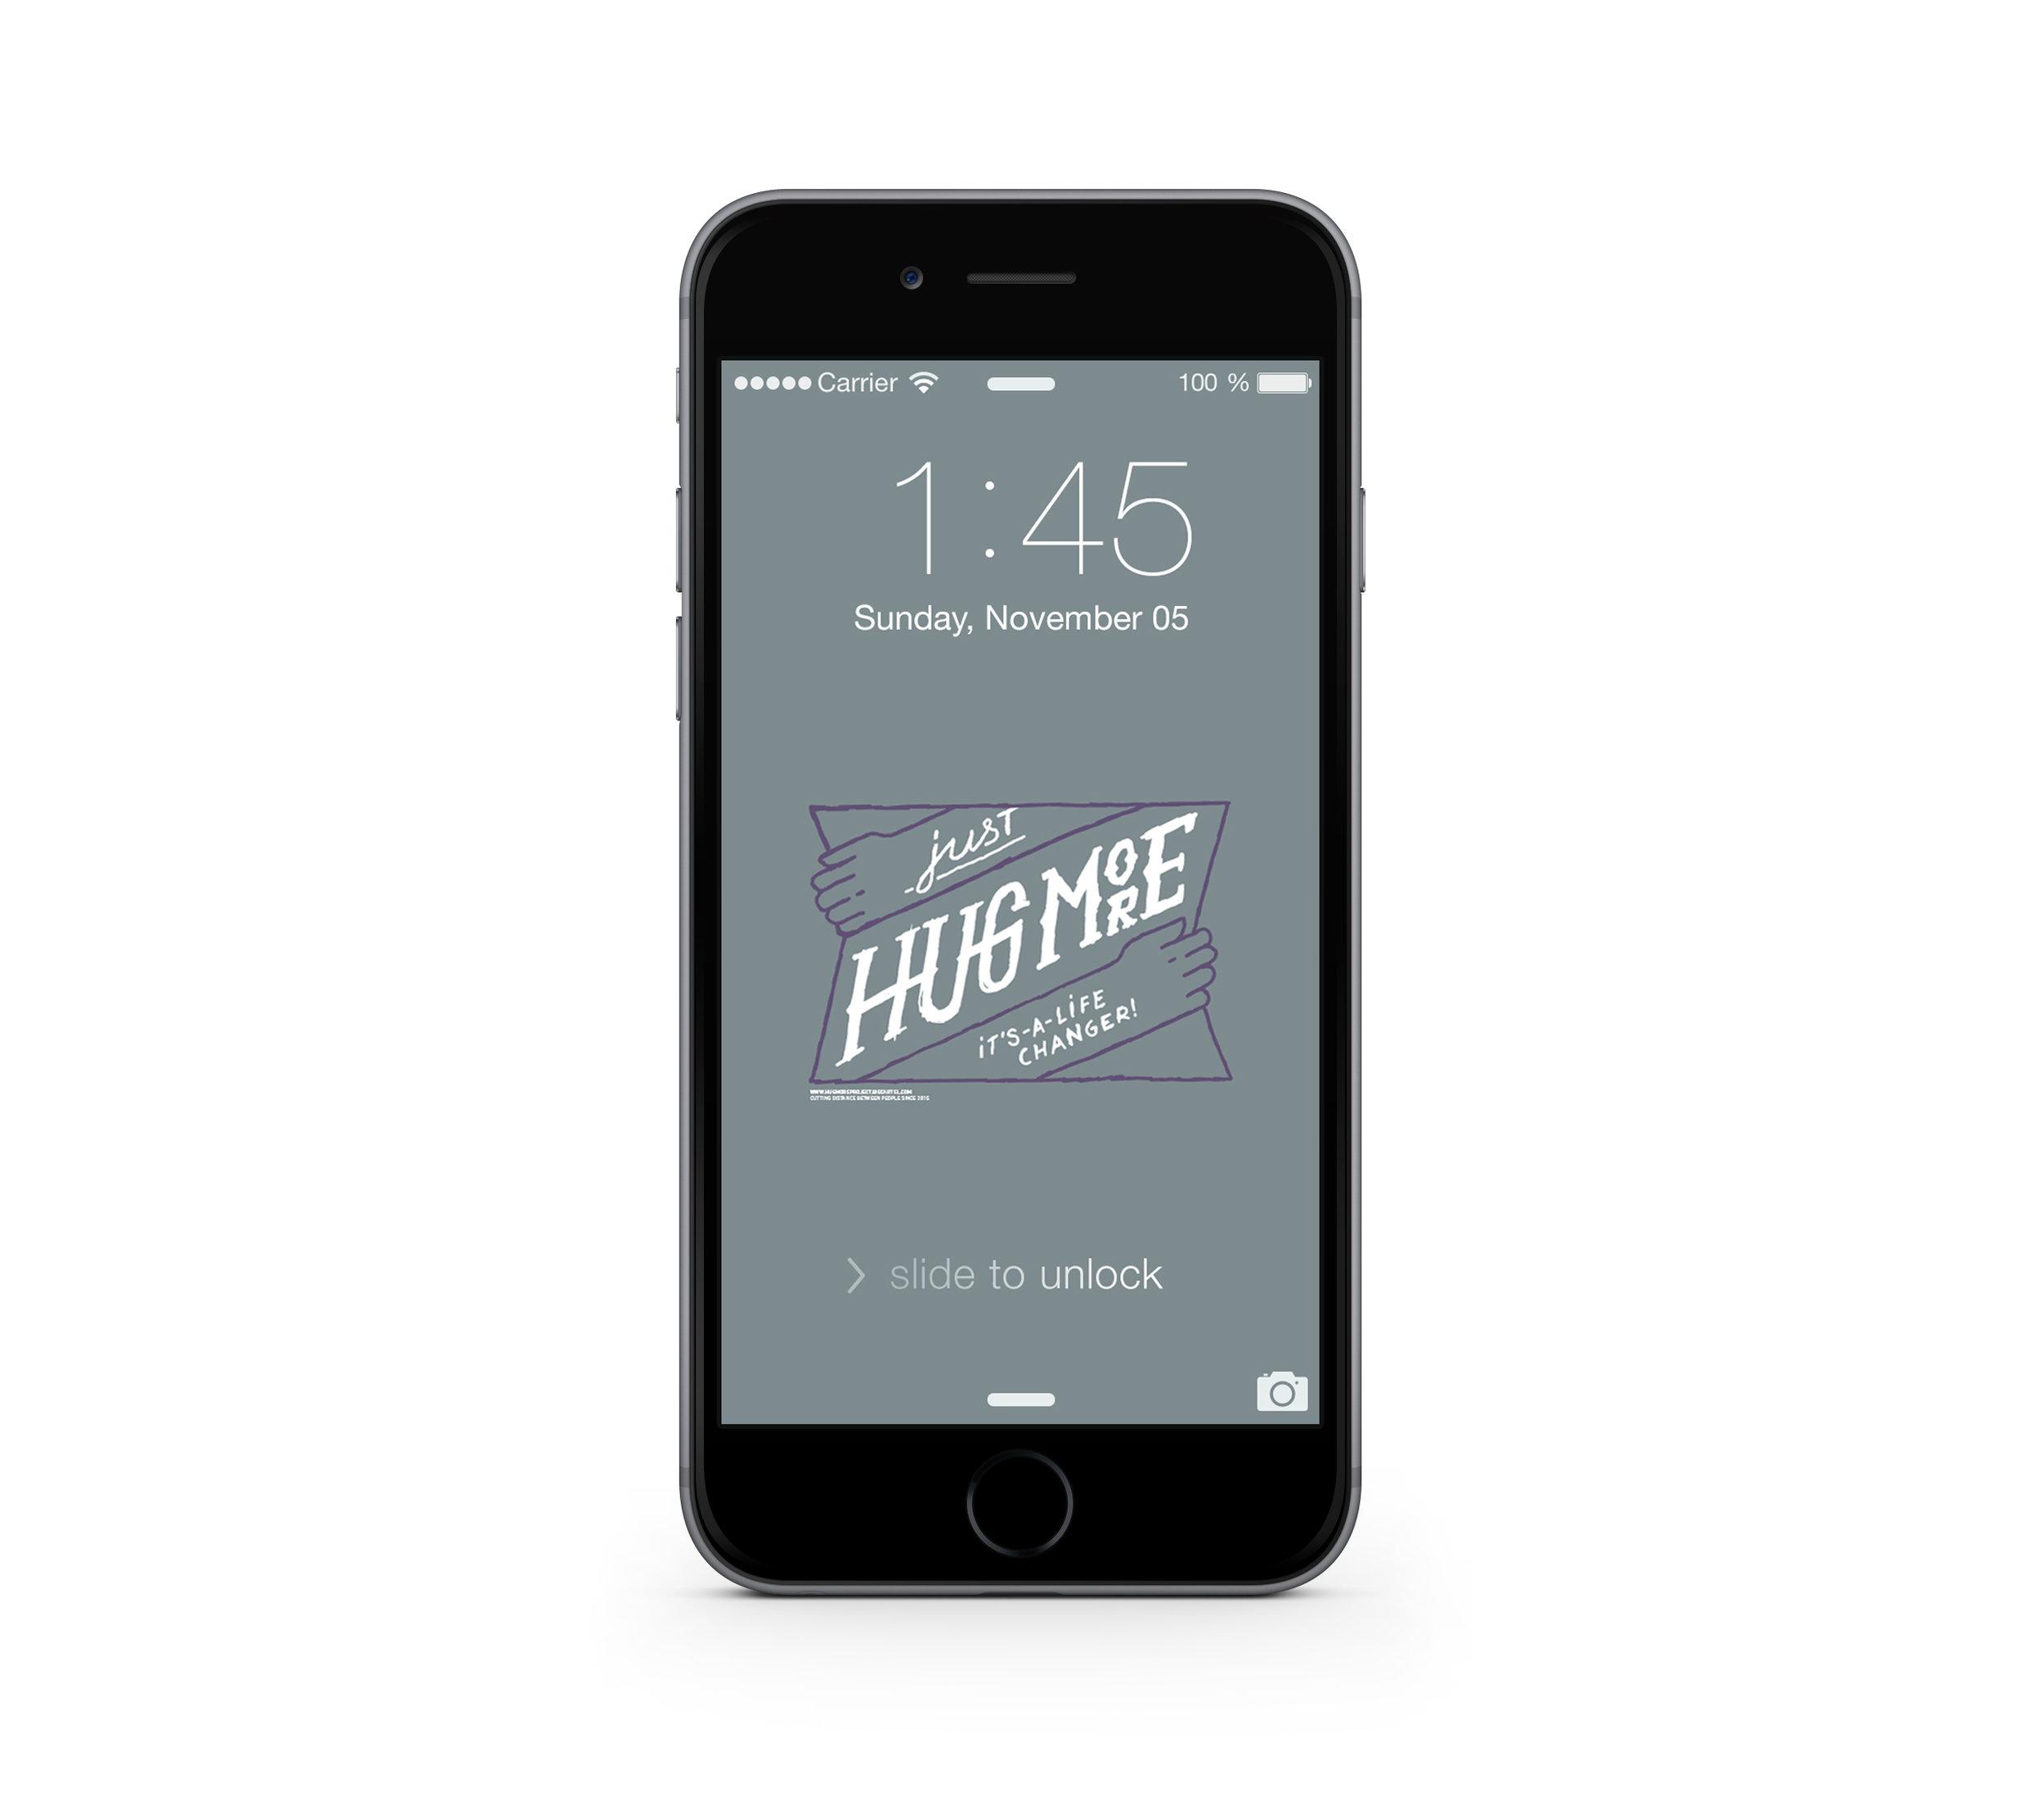 just-hug-more-typo-011-iPhone-mockup-onwhite.jpg